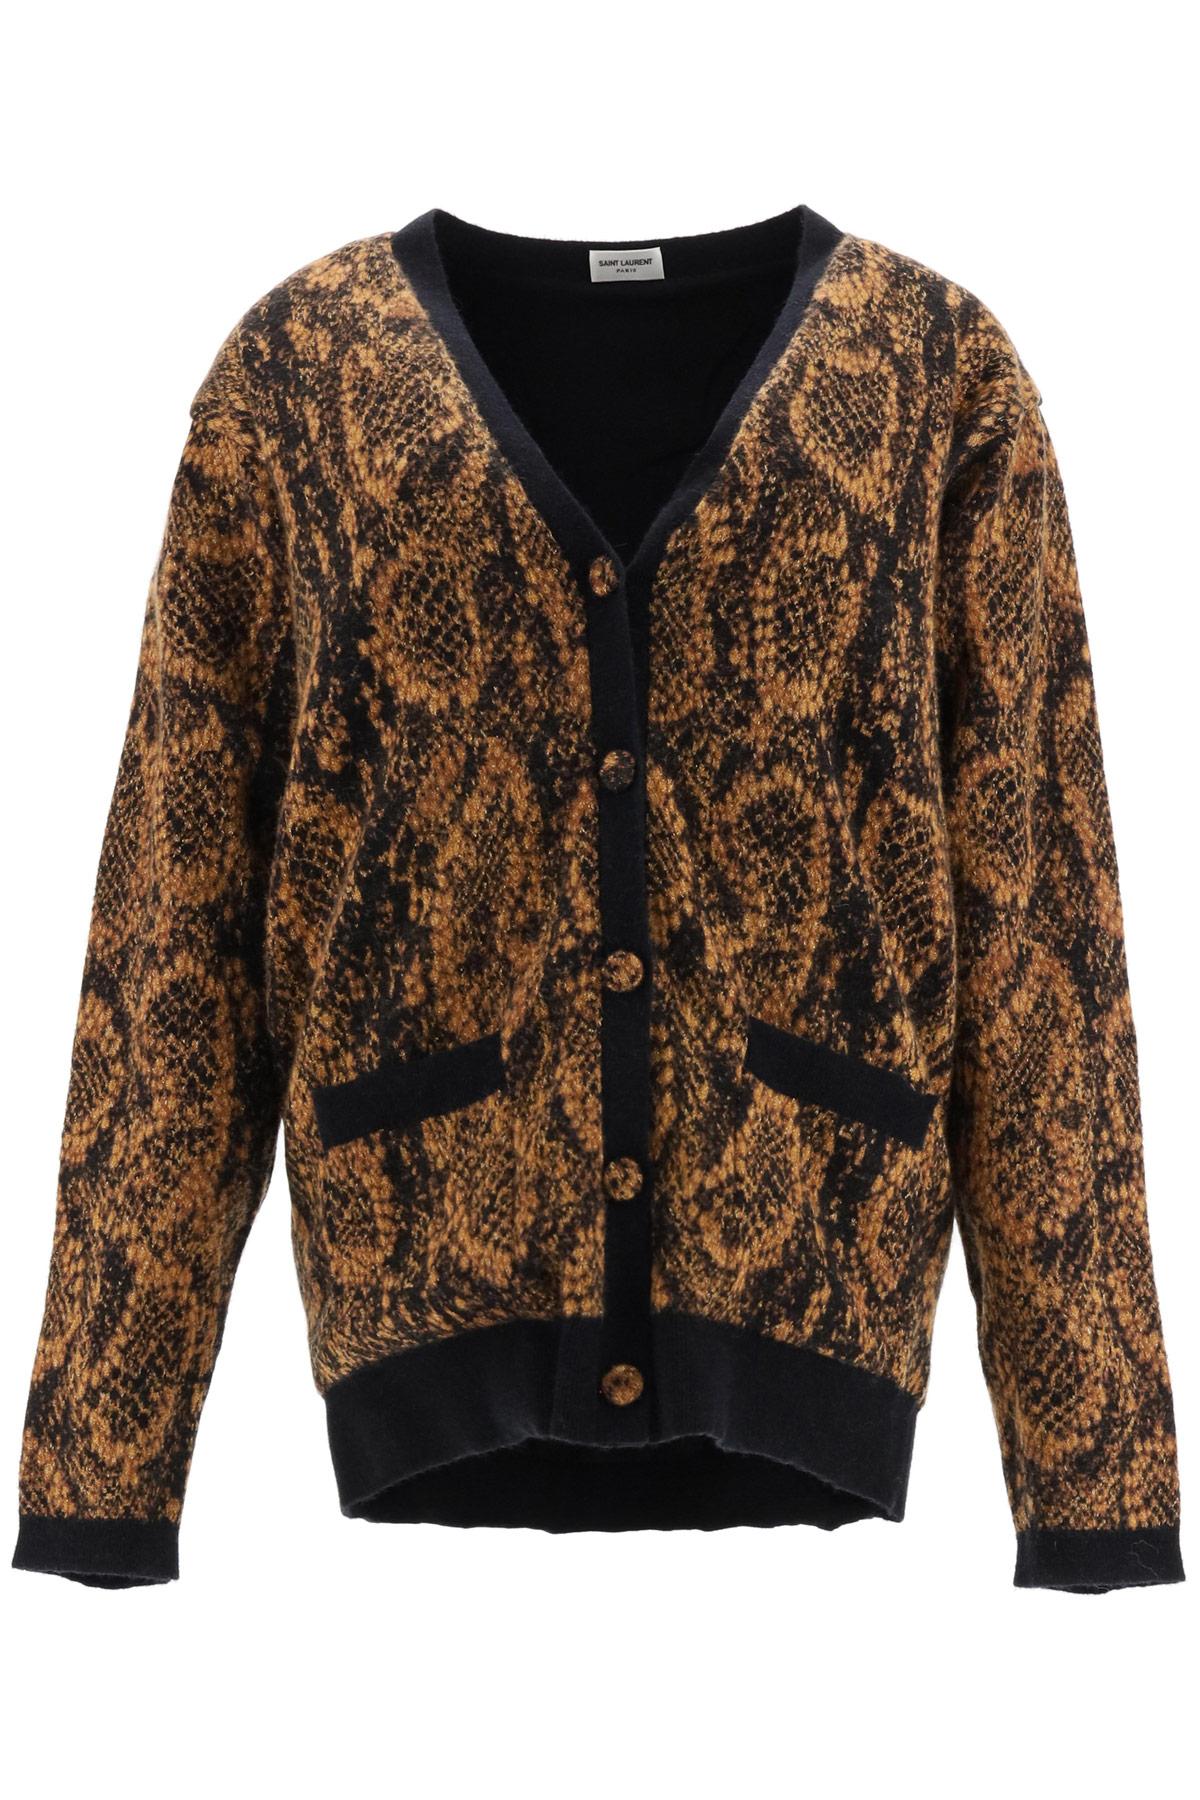 SAINT LAURENT JACQUARD SNAKE CARDIGAN S Black, Brown, Gold Wool